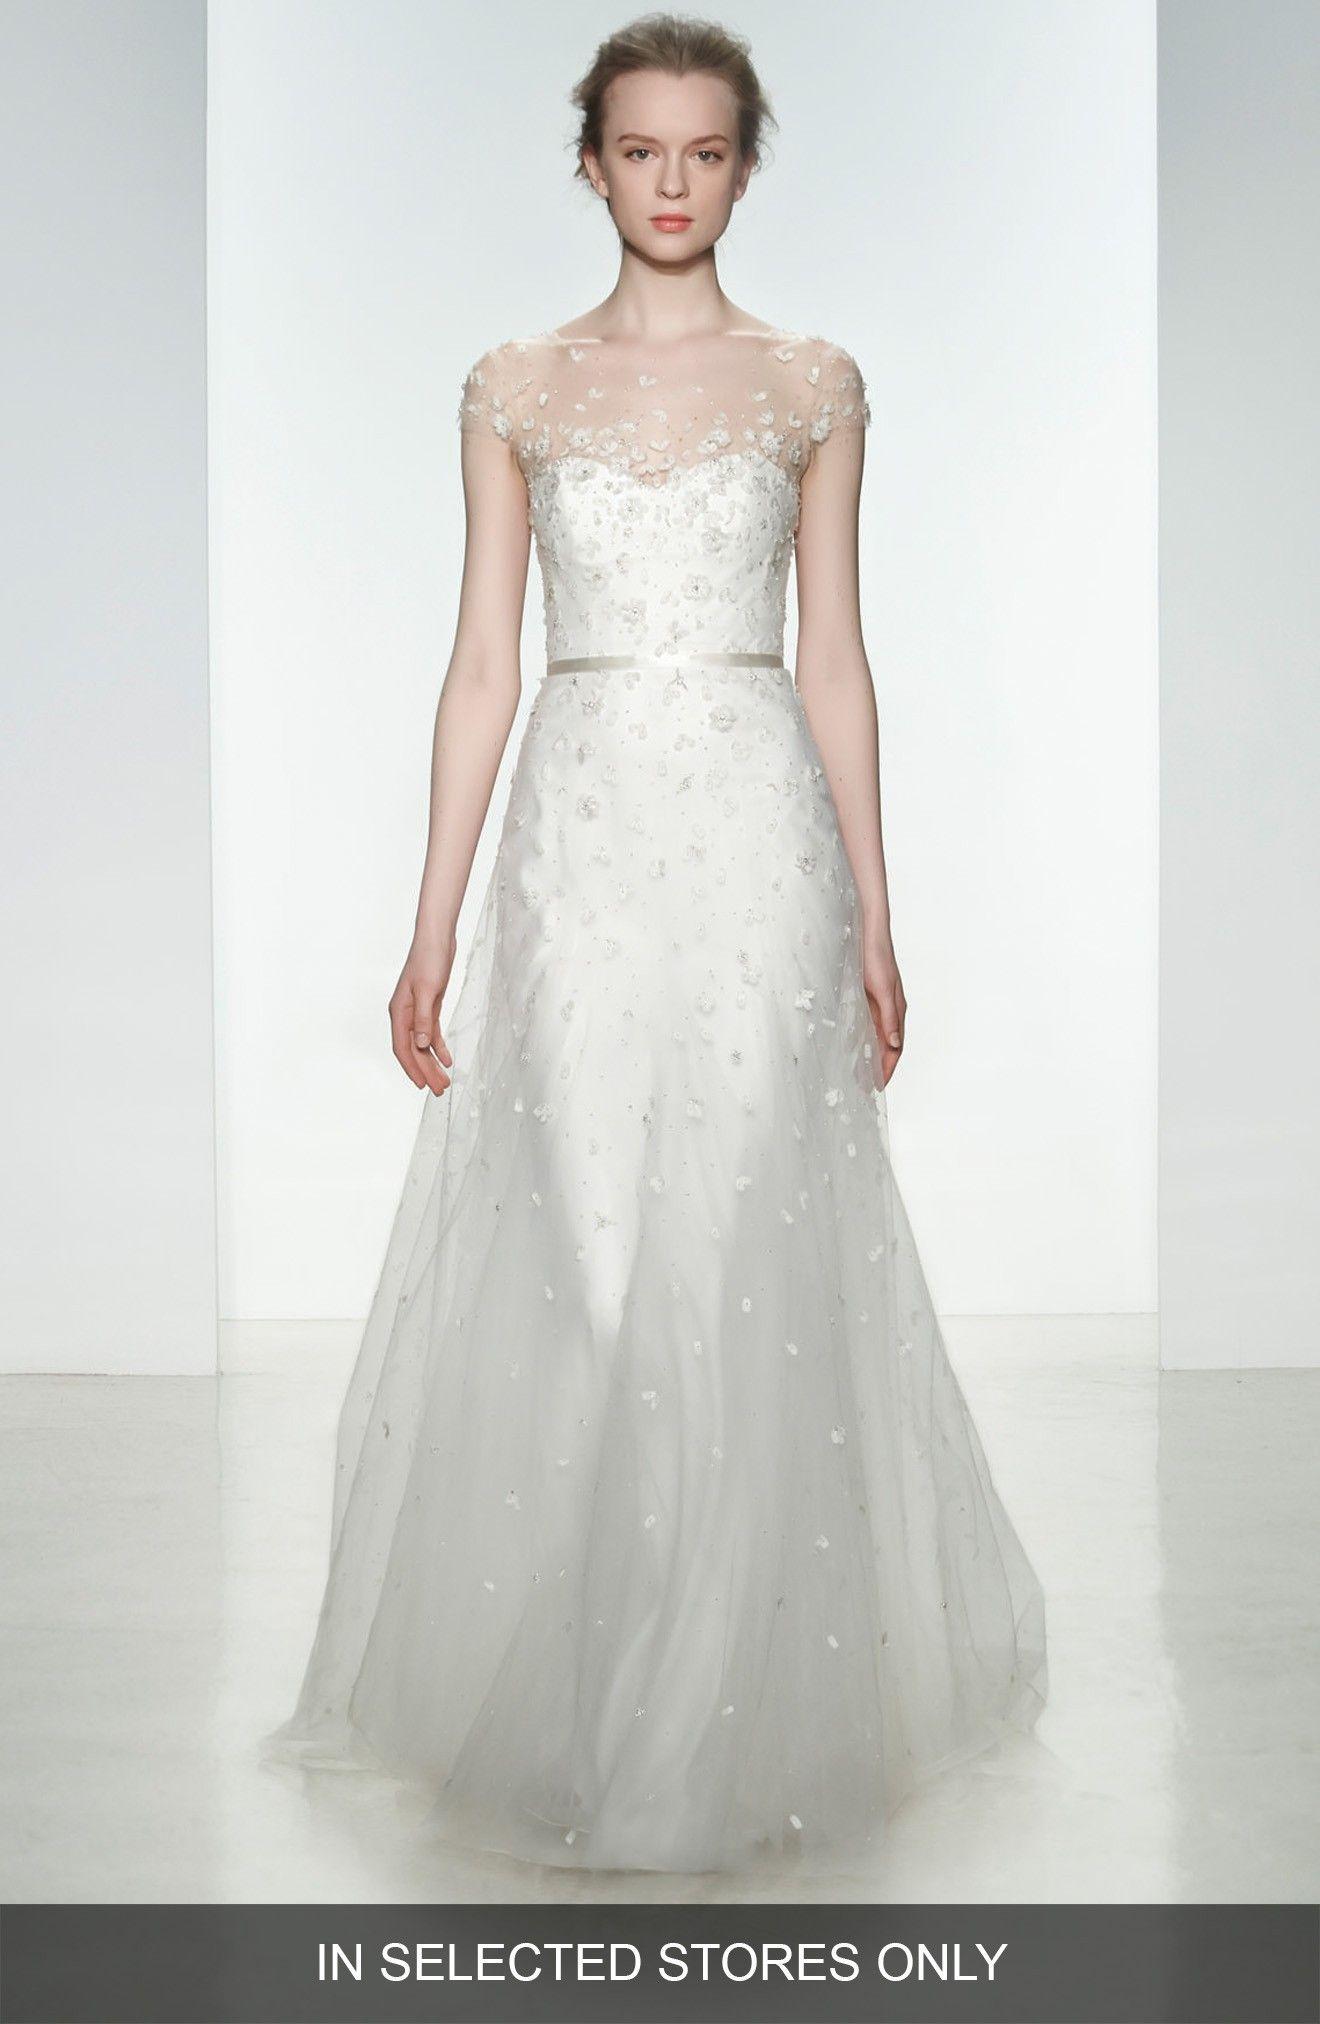 Buy CHRISTOS BRIDAL Ellie Embellished Illusion Neck Tulle Gown ...